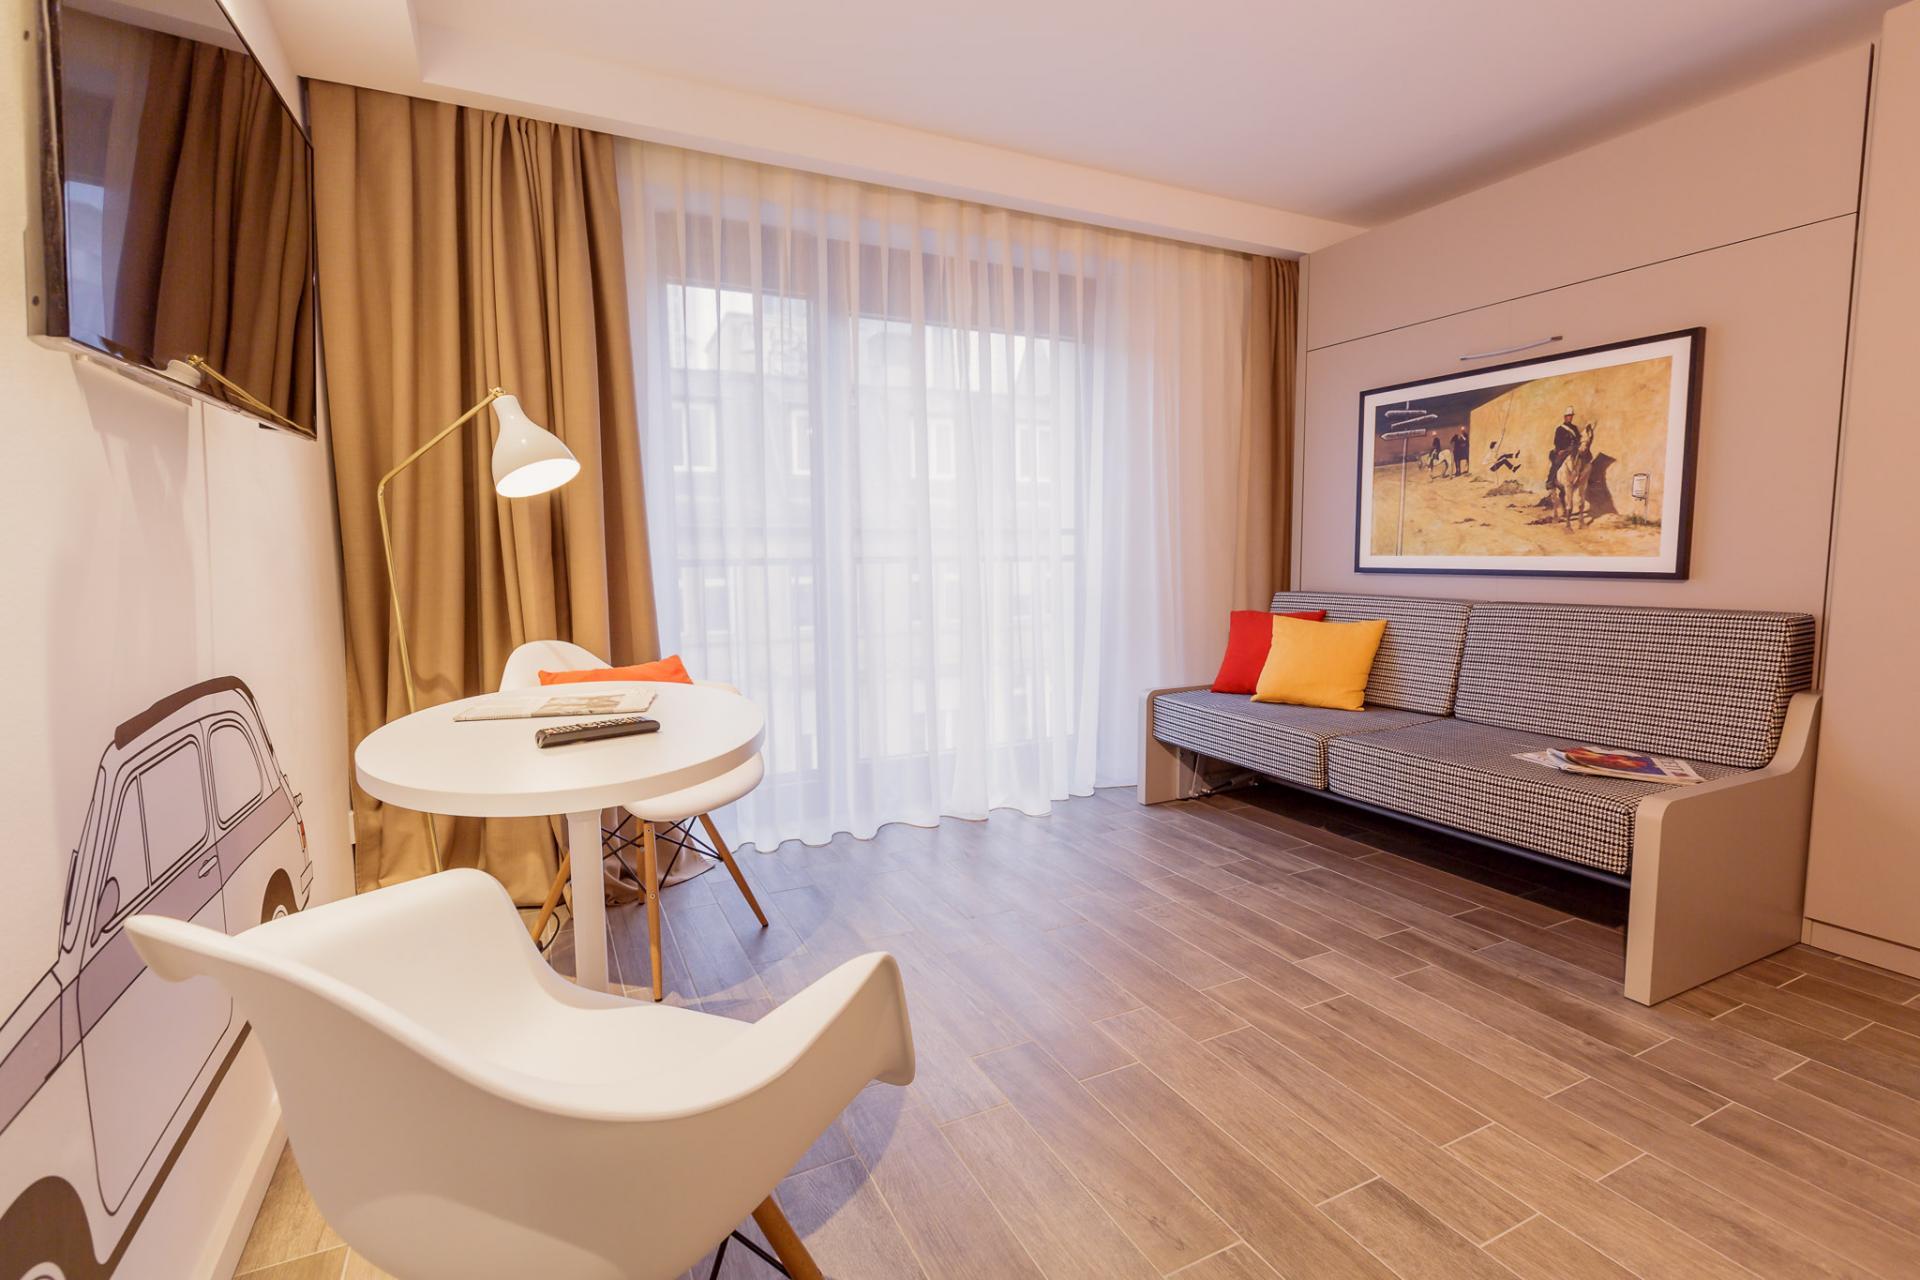 Living room at Brera Elbestrasse 29 - Citybase Apartments